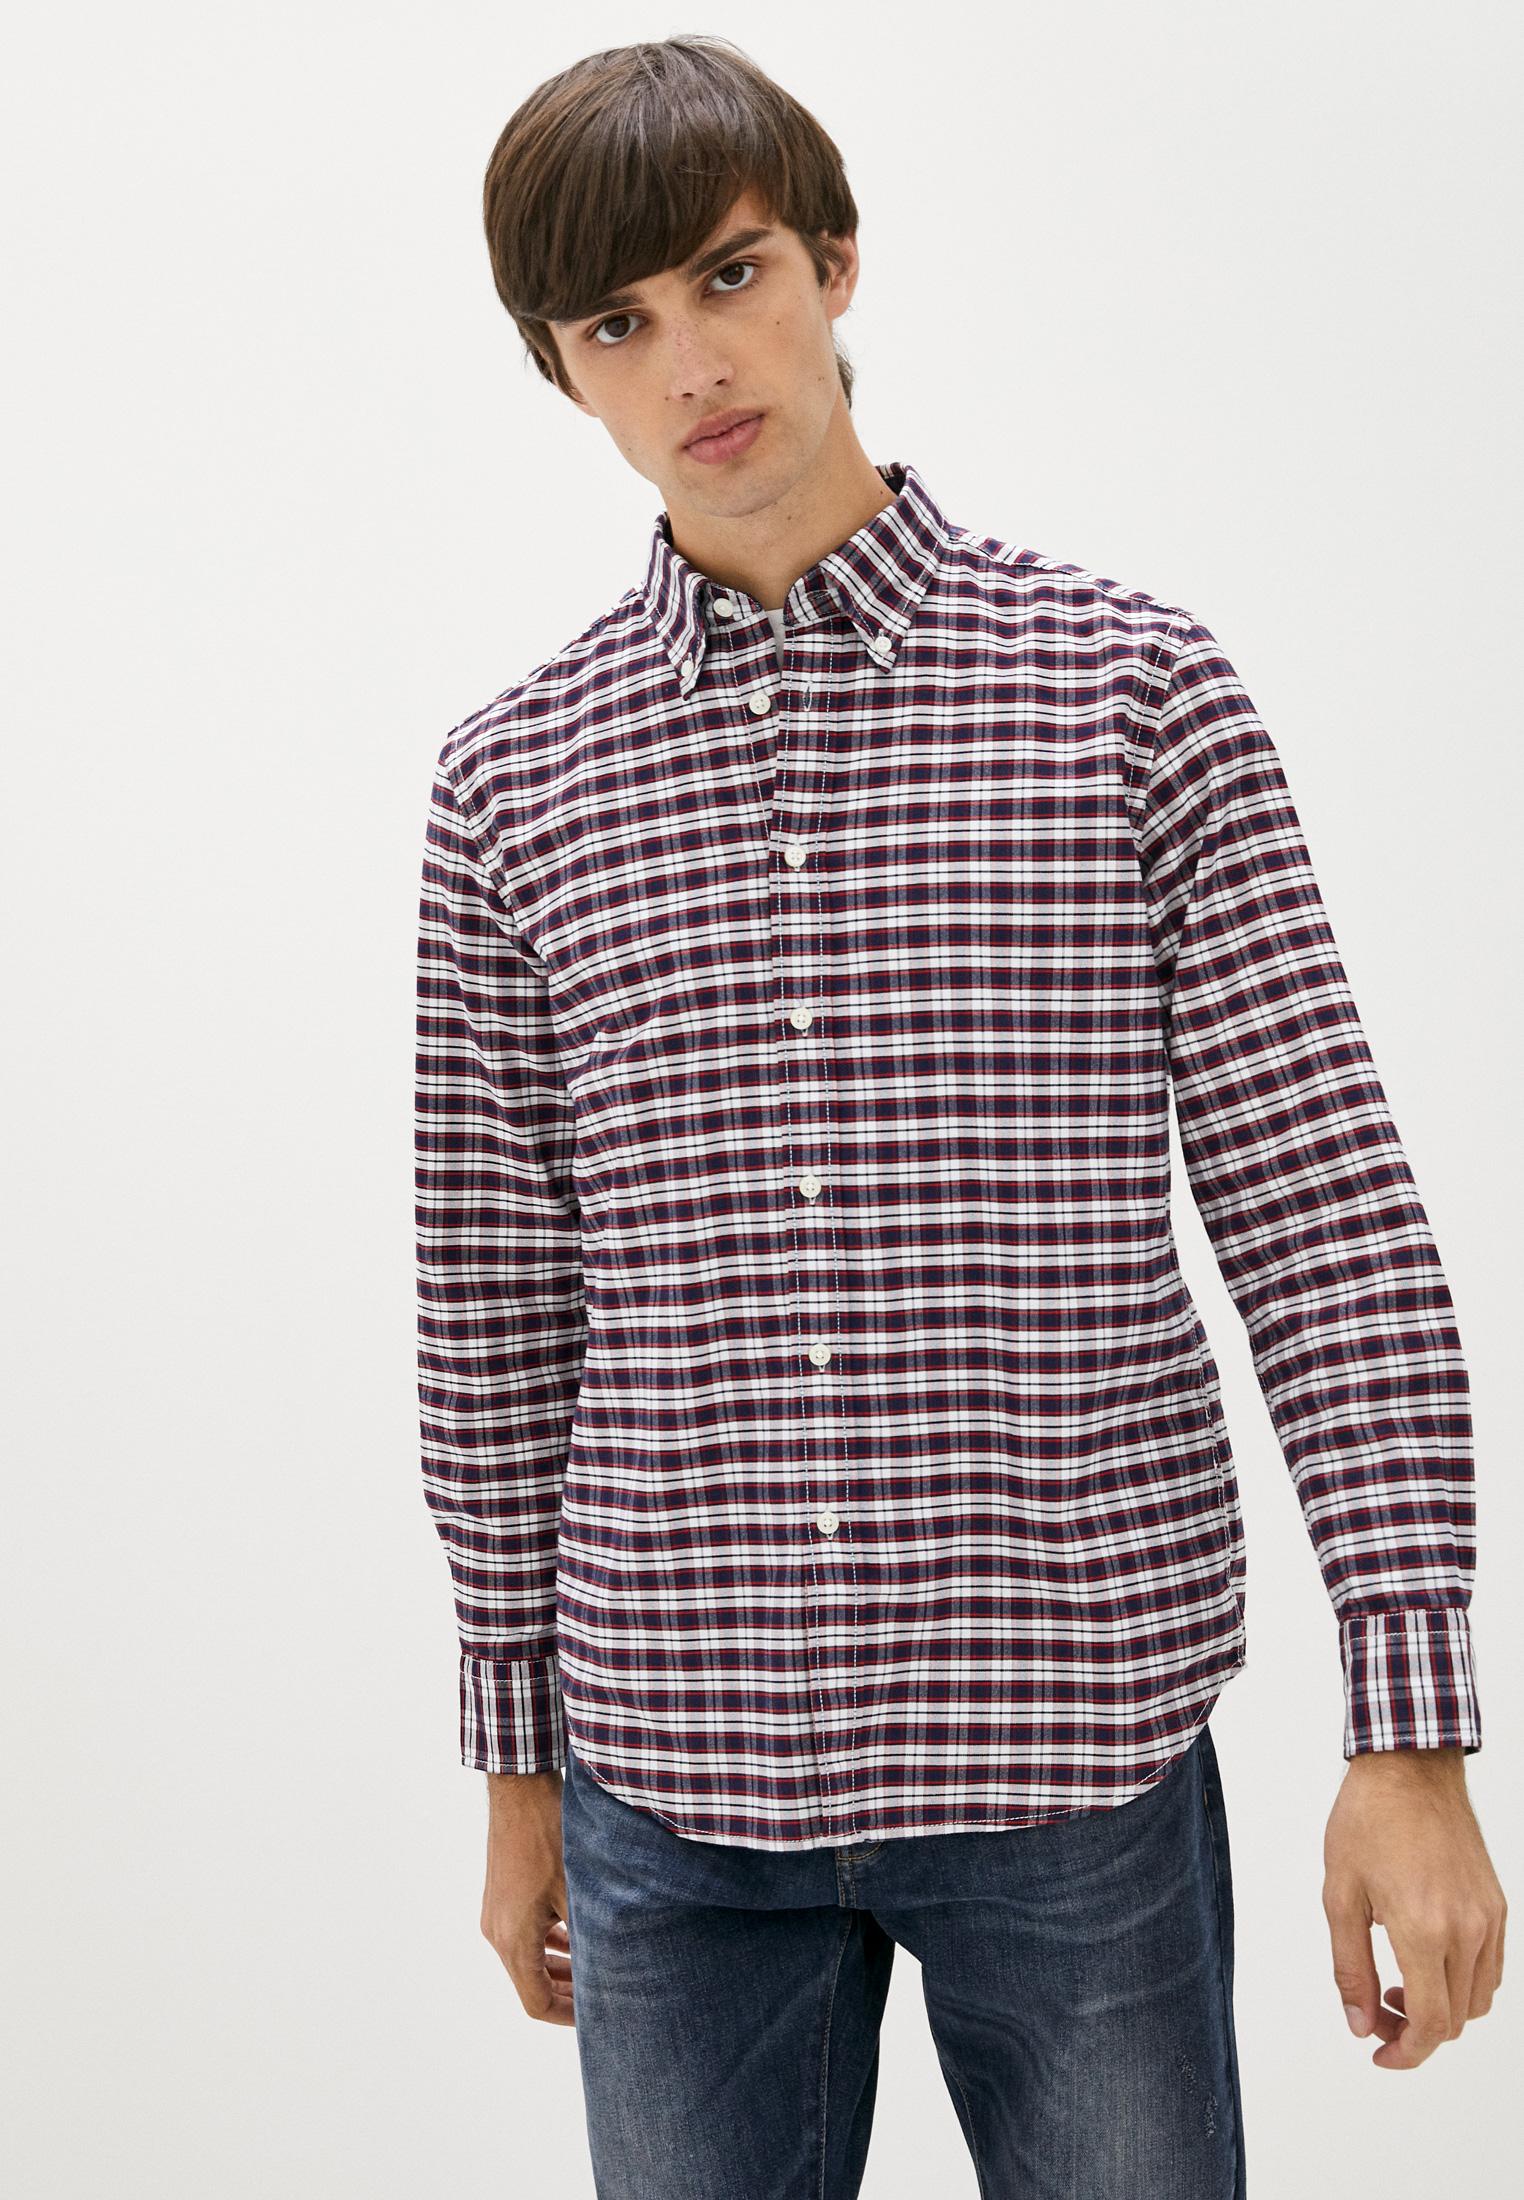 Рубашка с длинным рукавом United Colors of Benetton (Юнайтед Колорс оф Бенеттон) 5DHZ5QL38